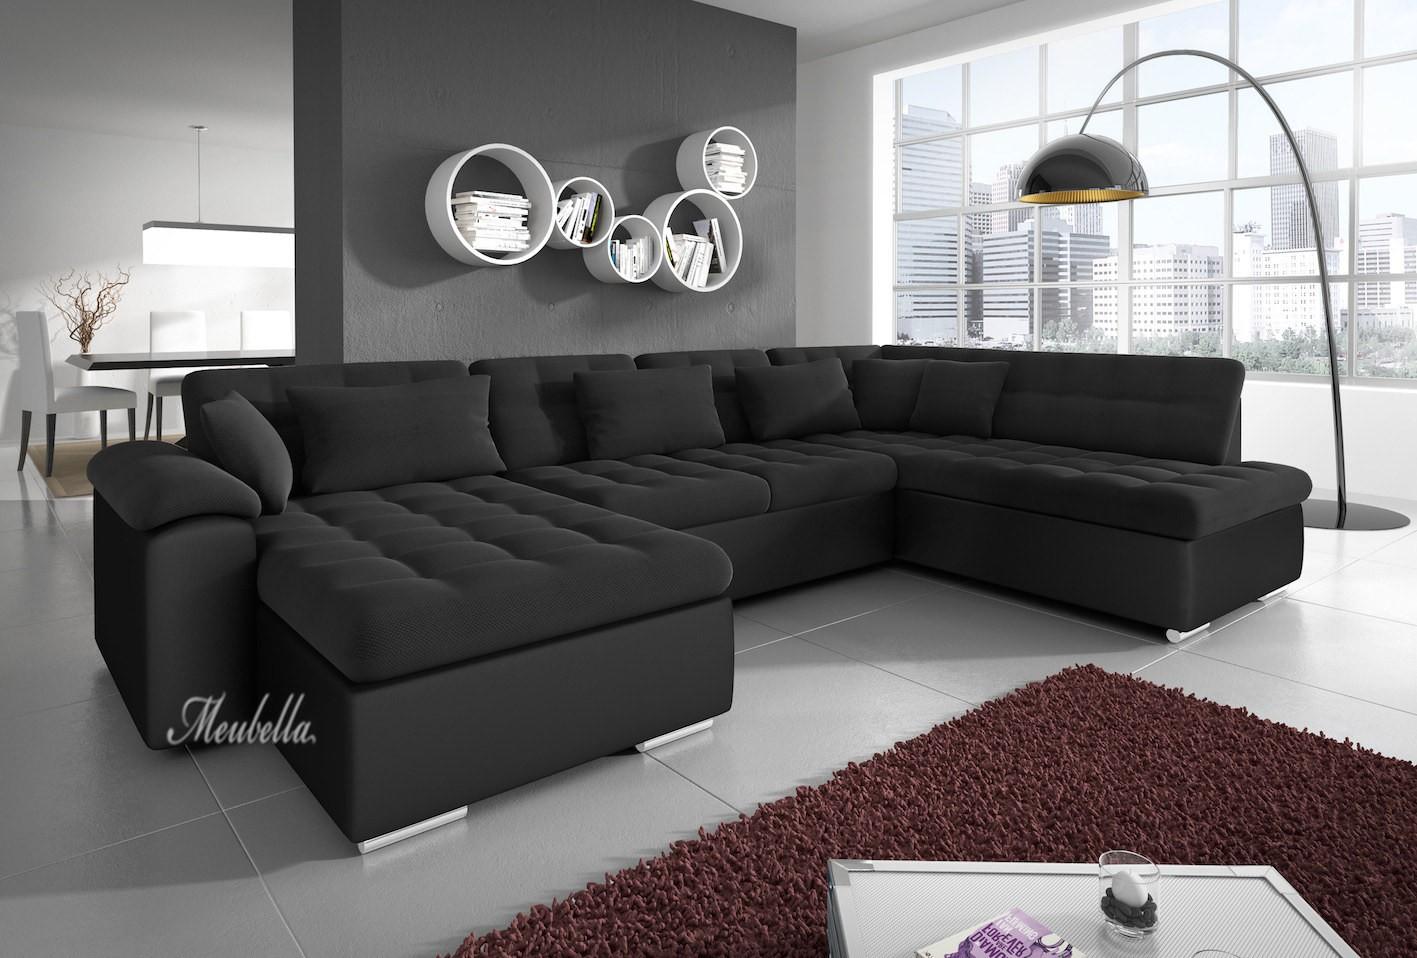 Hoekbank nicoreta zwart links leer stof actie meubella - Zwarte bank lounge ...